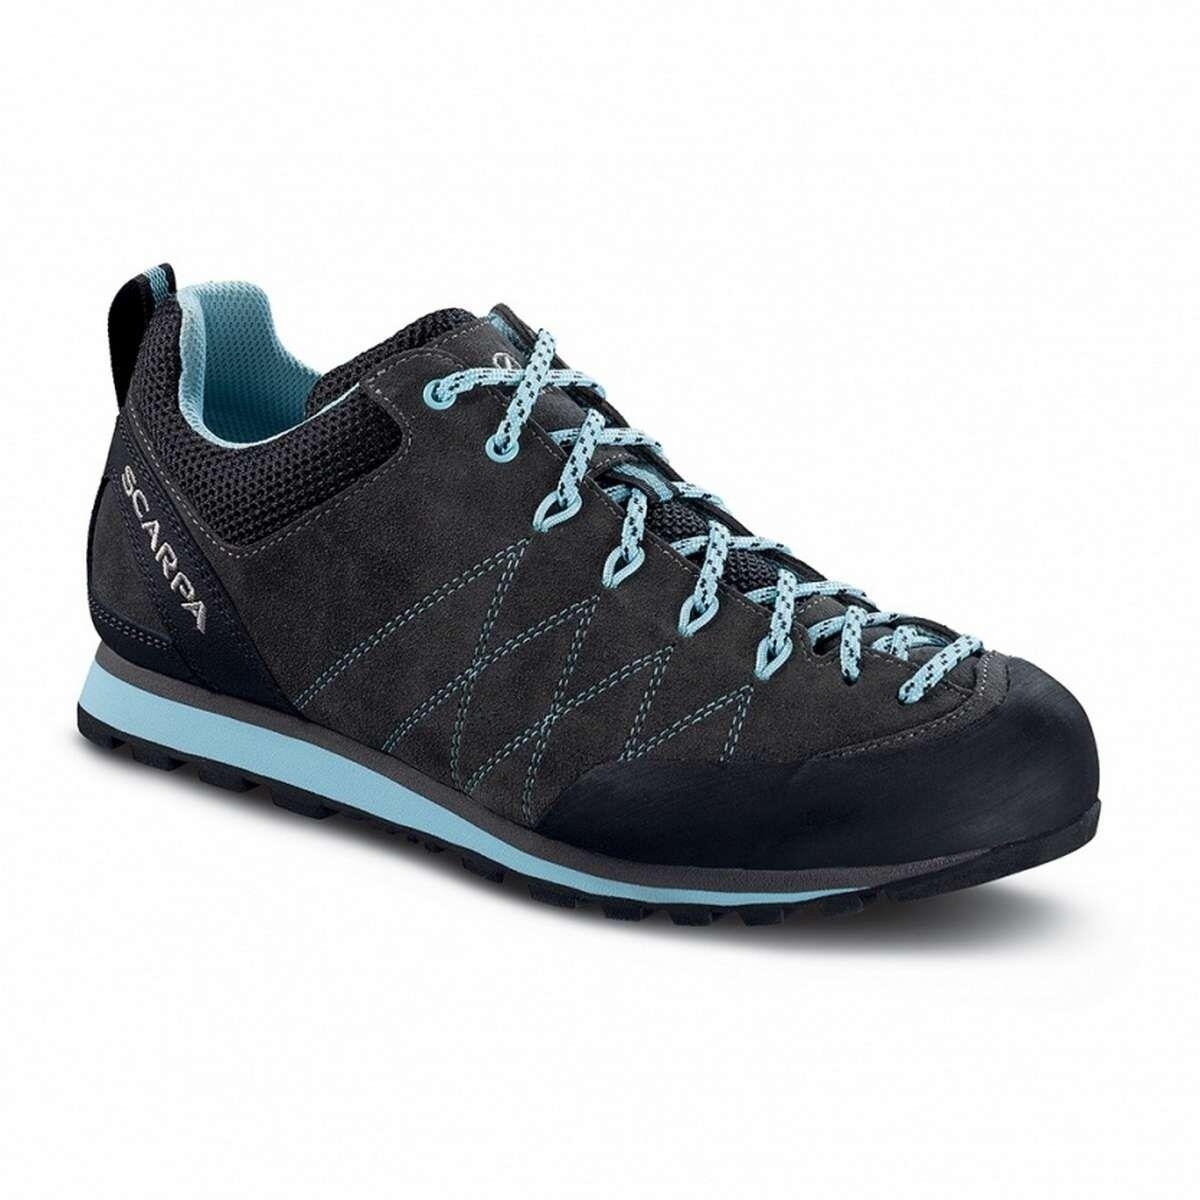 Scarpa Crux Women - Womens suede approach walking shoe - GoreTex